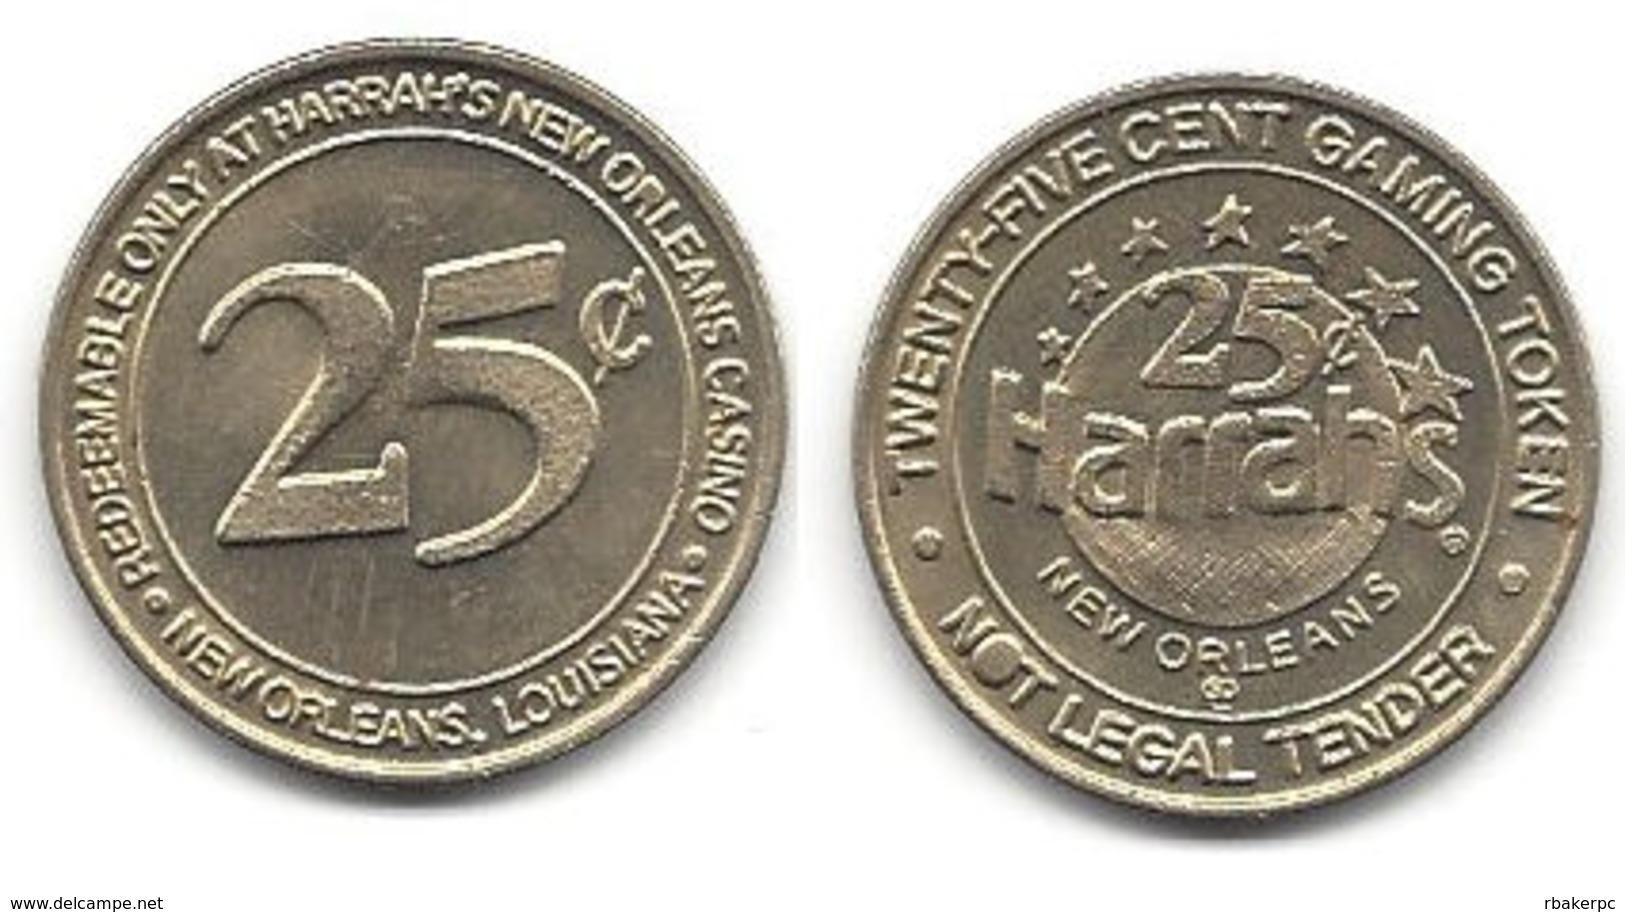 Harrah's Casino New Orleans LA 25 Cent Token - Casino